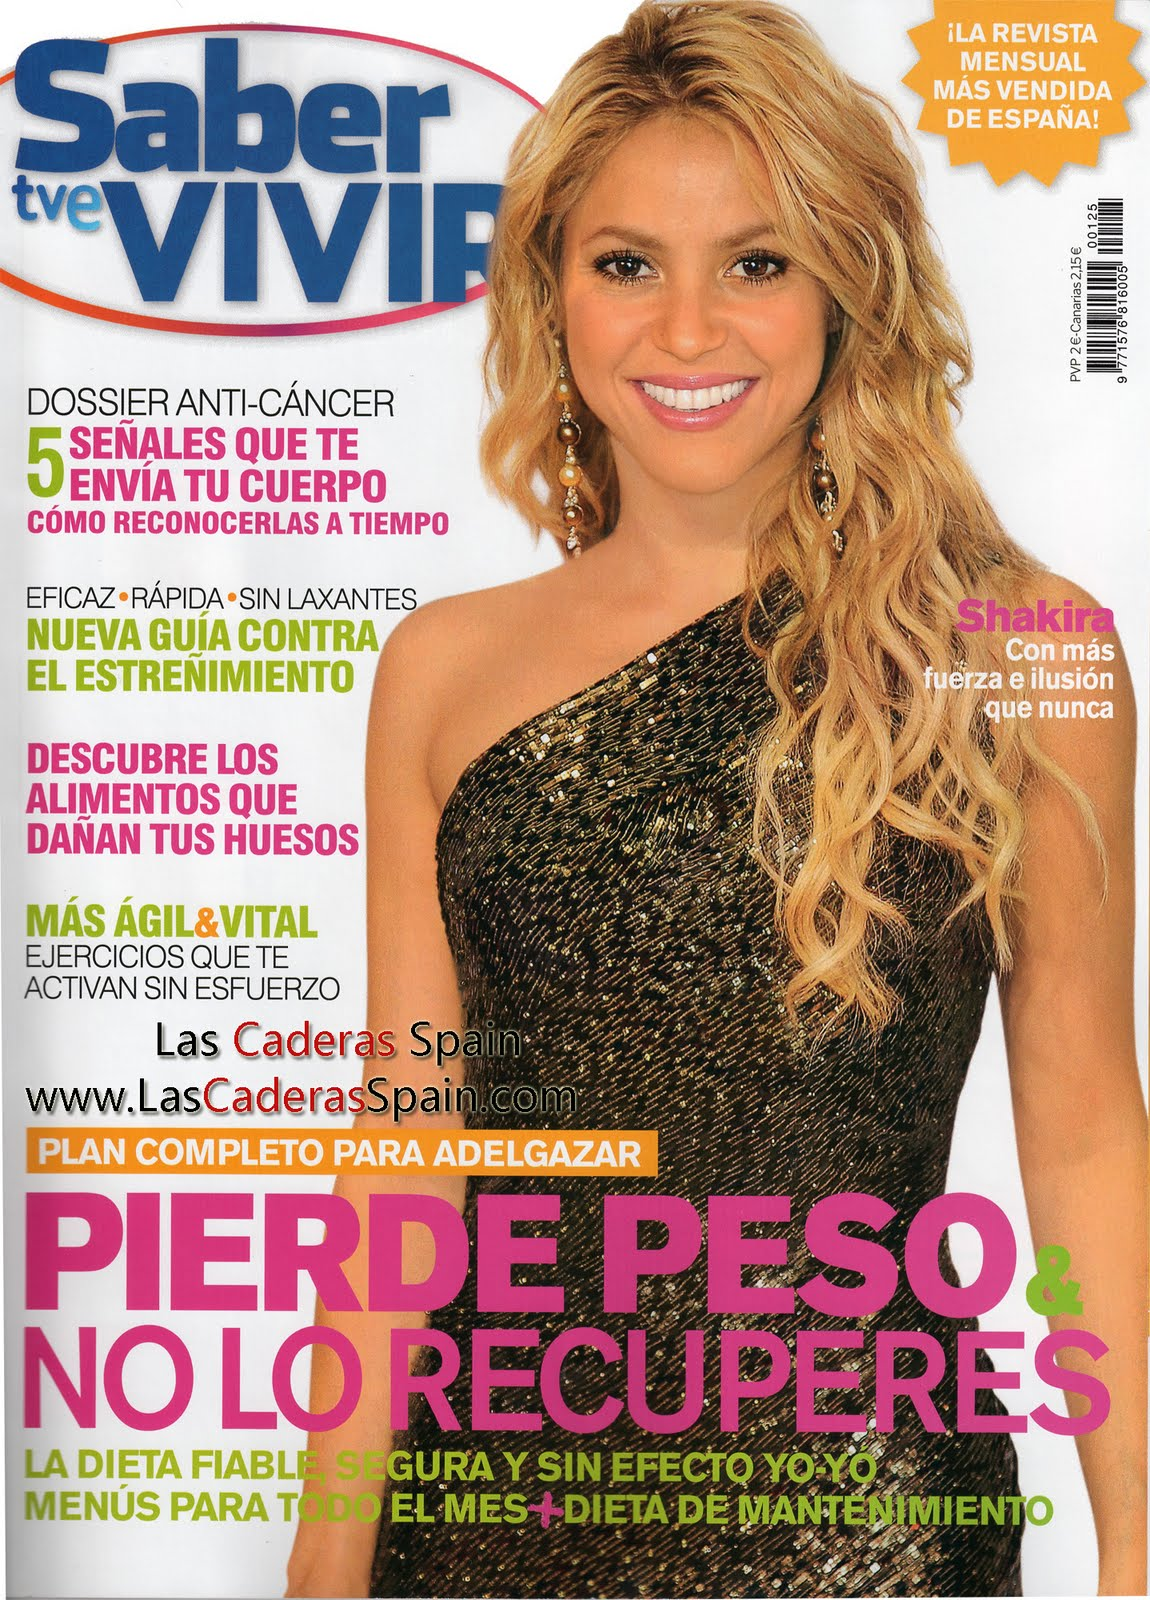 Shakira Argentina Shakira En La Revista Saber Vivir De Espa A ~ Dieta Adelgazamiento Saber Vivir